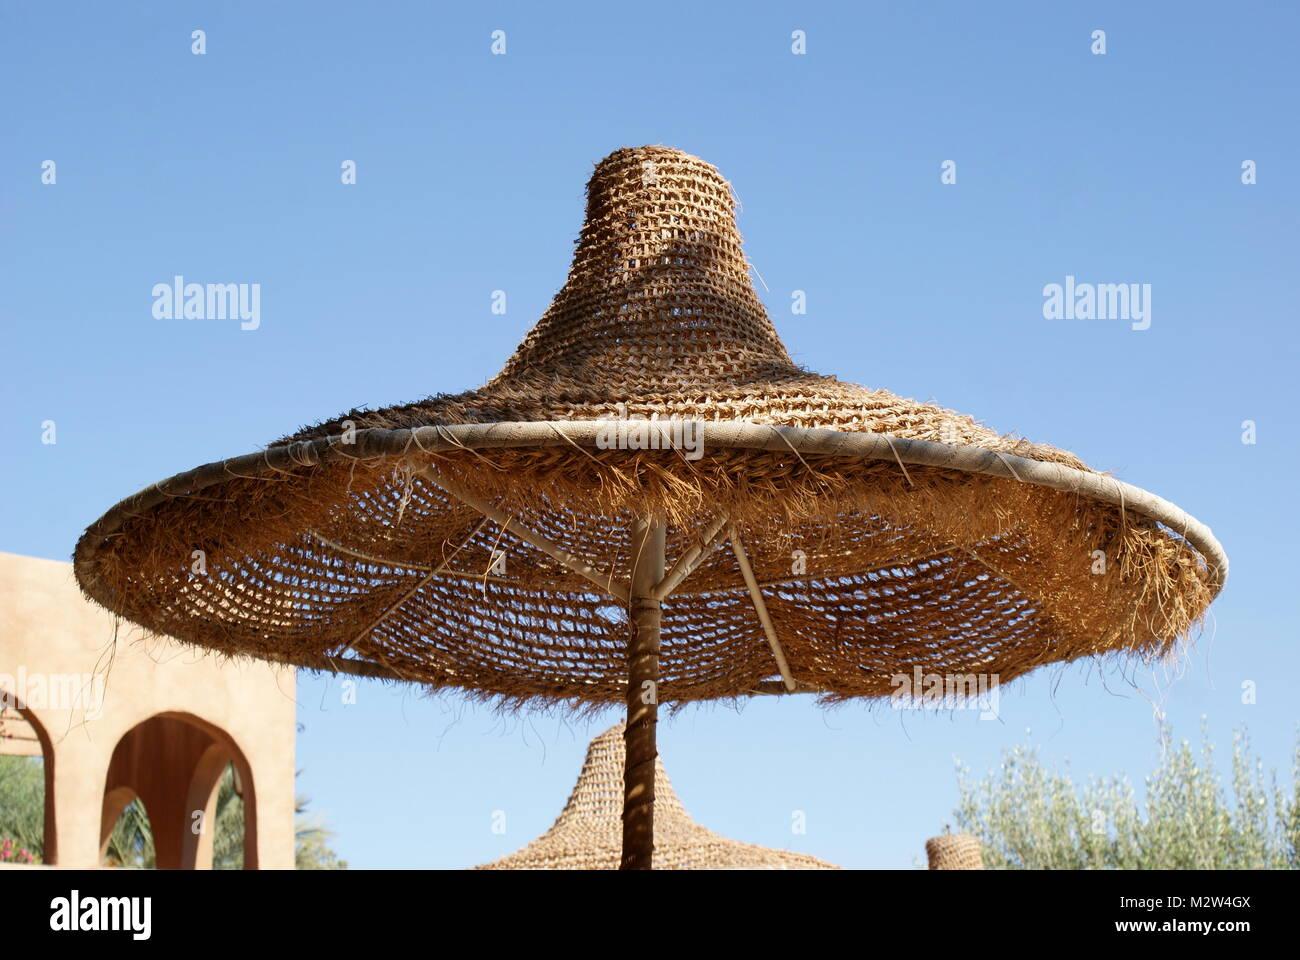 Straw umbrella sunshade, Tamerza, Tunisia - Stock Image